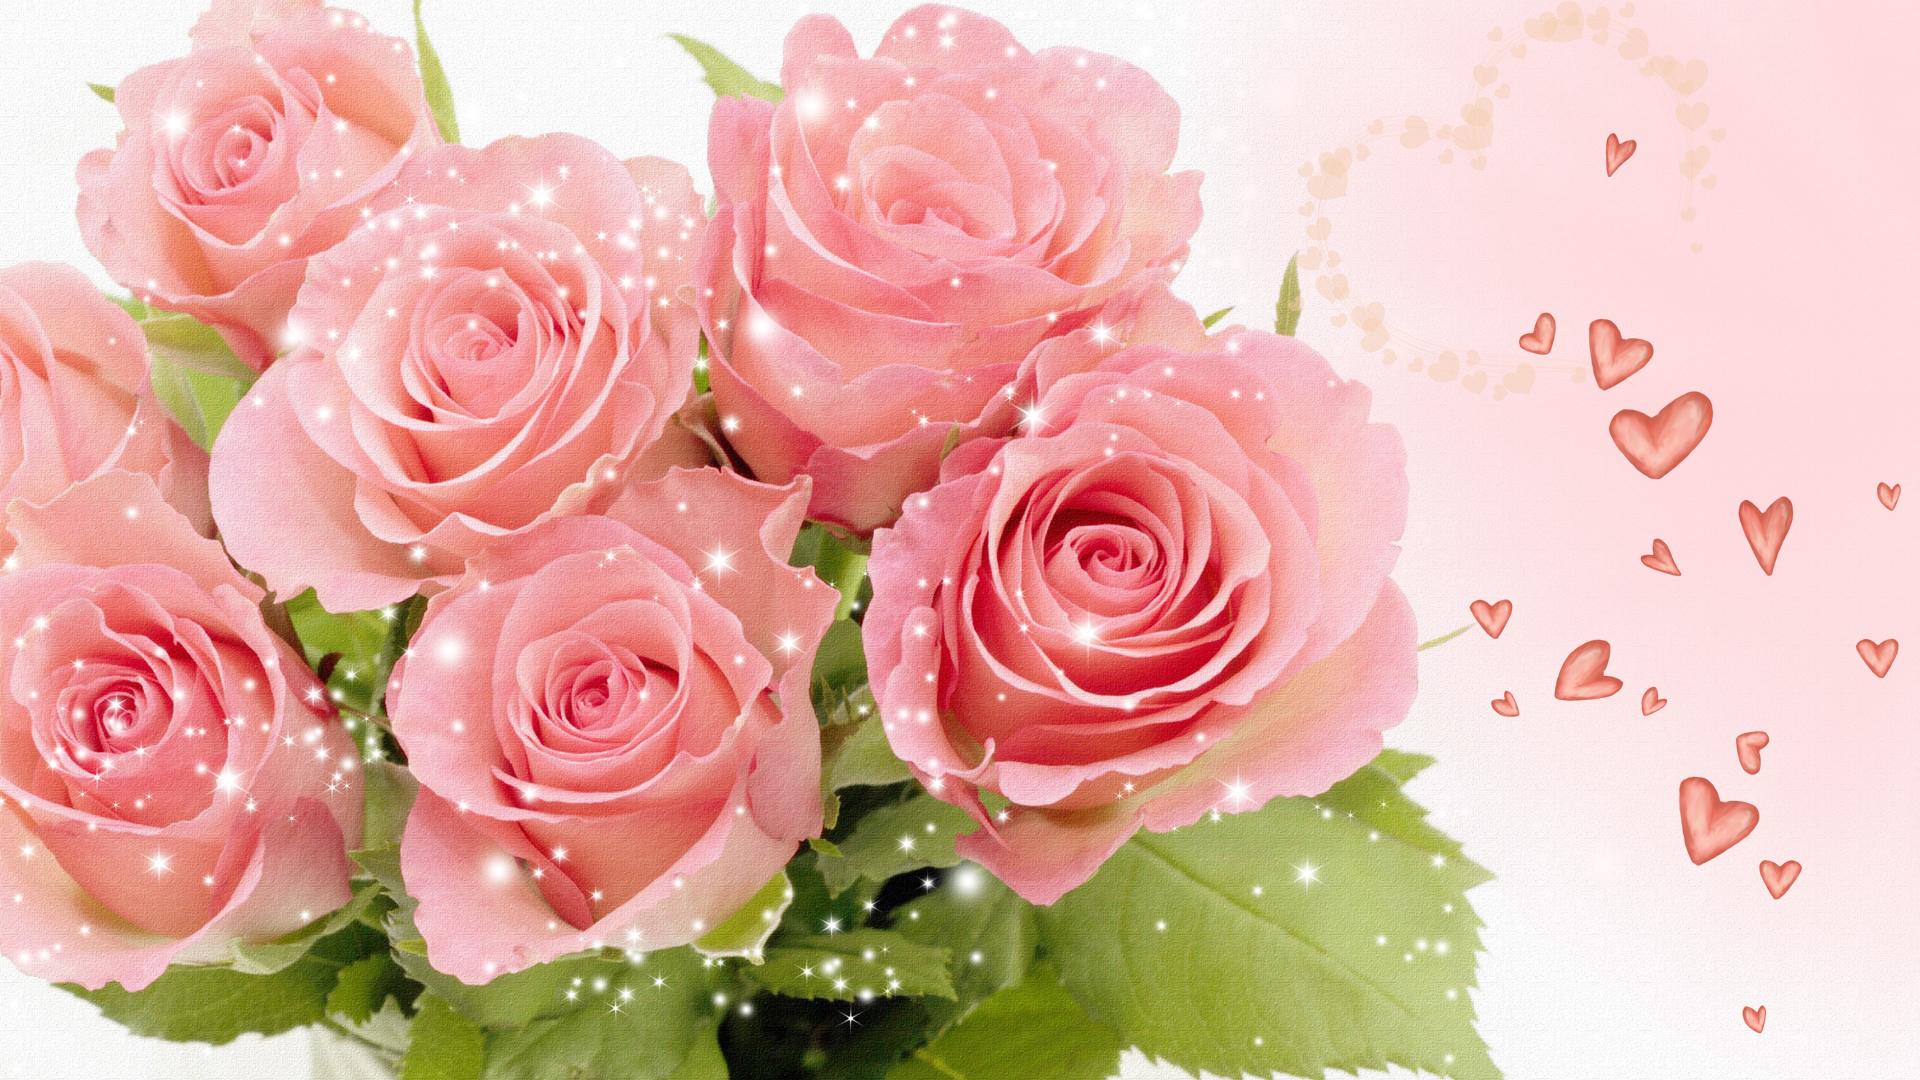 Pretty गुलाबी Rose वॉलपेपर